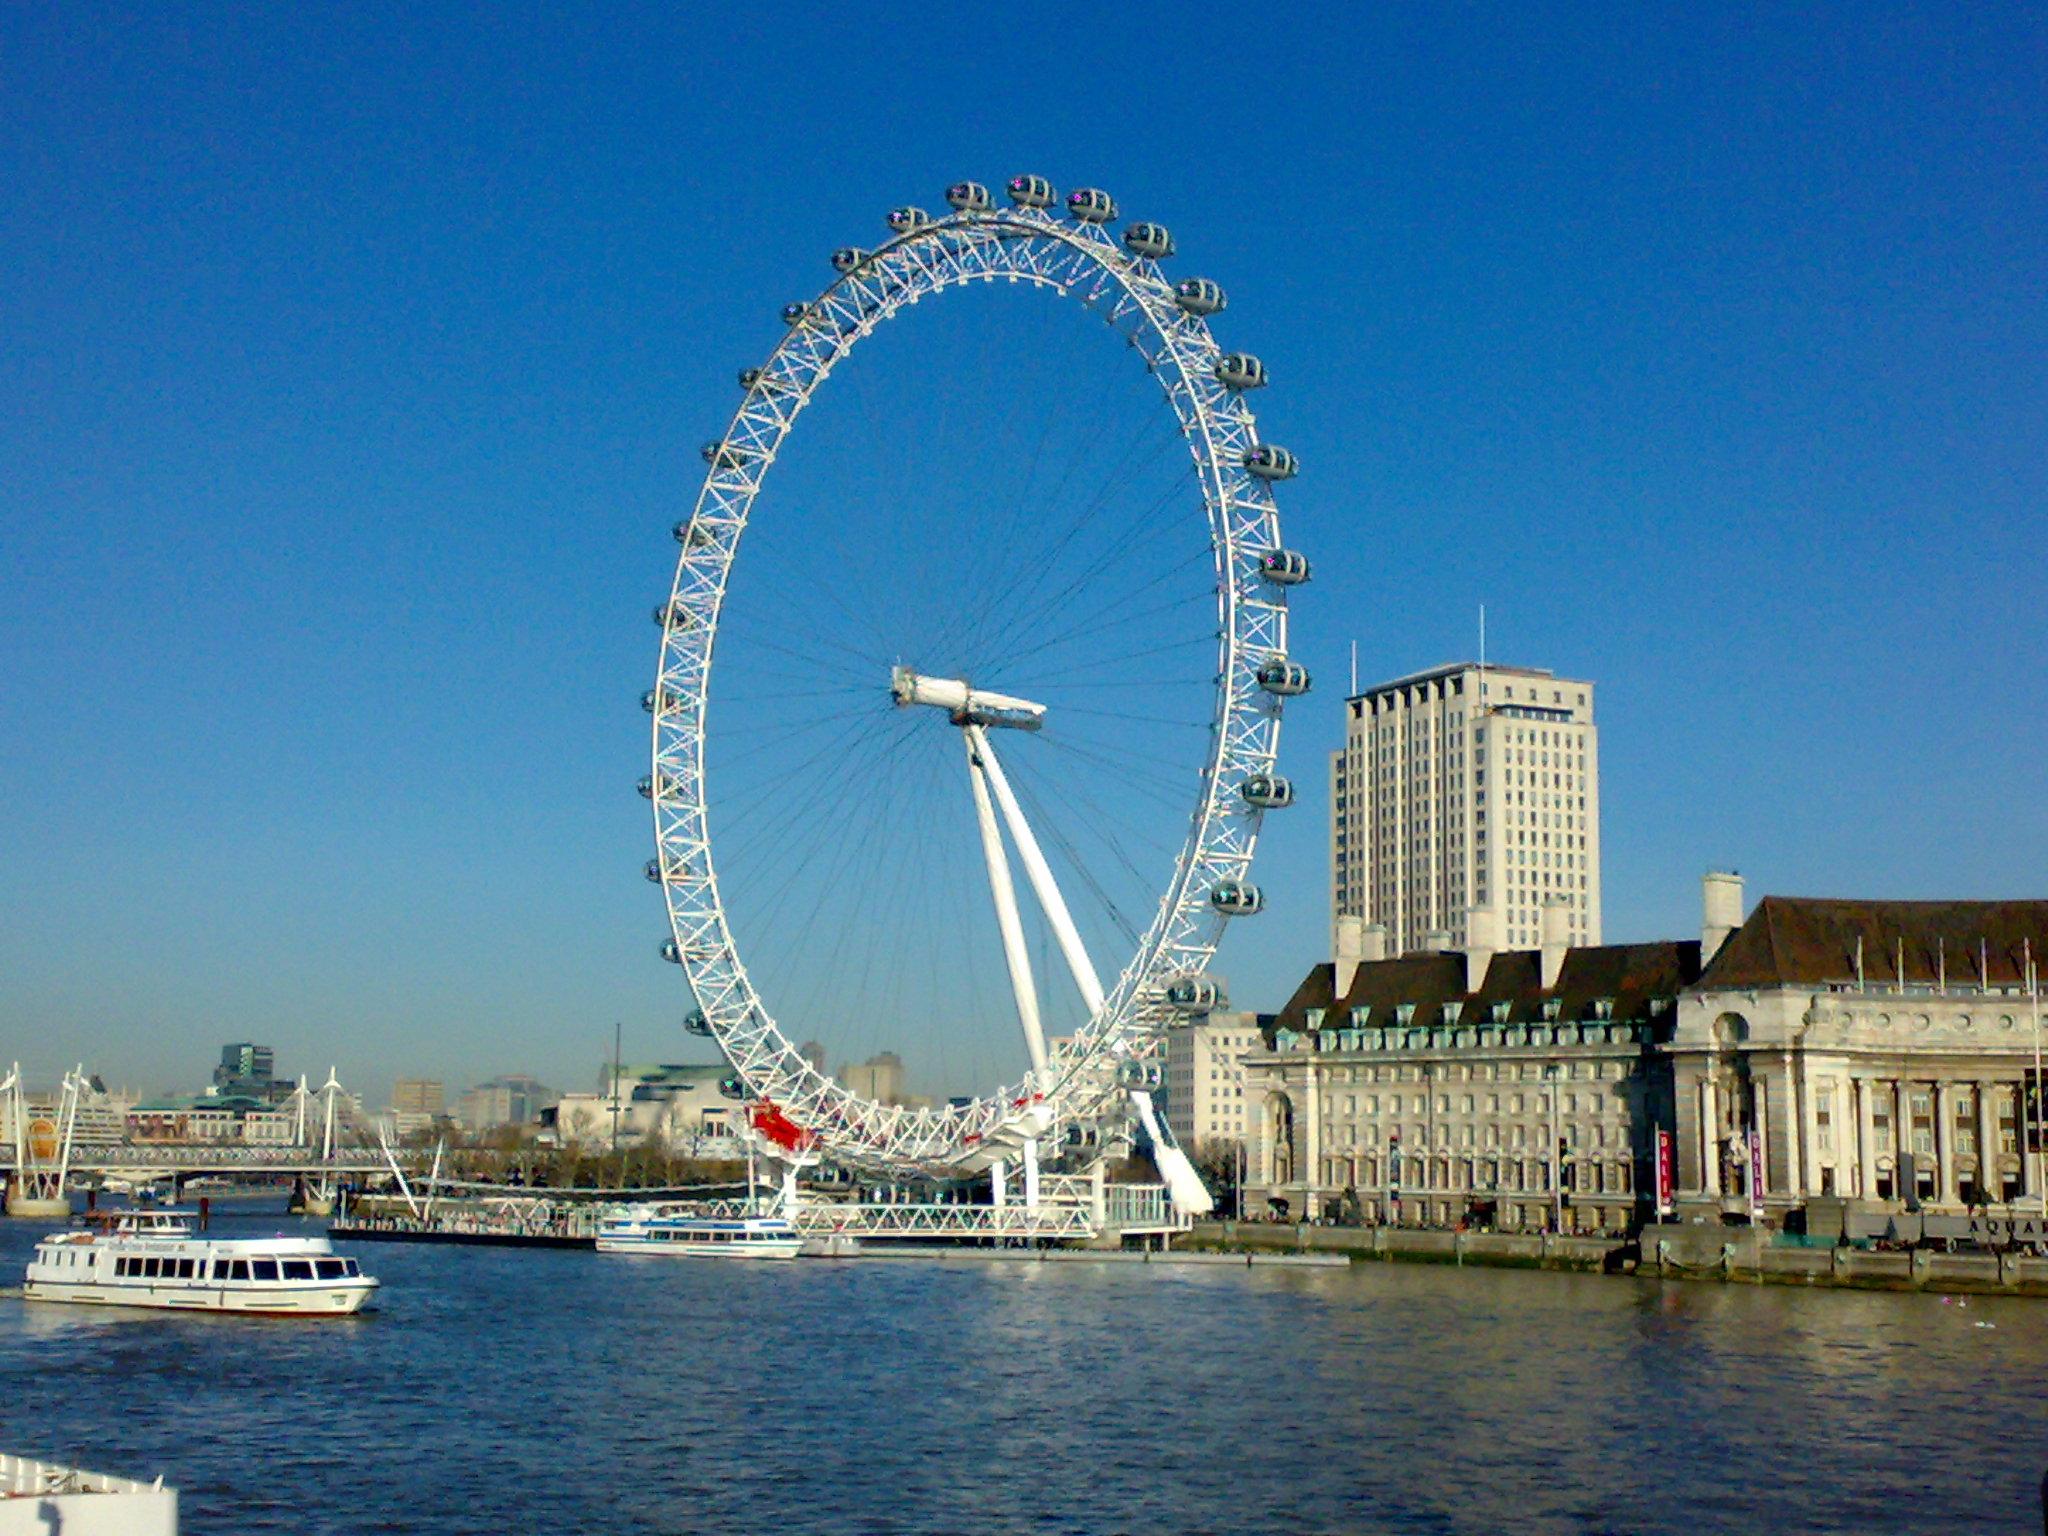 london eye in UK